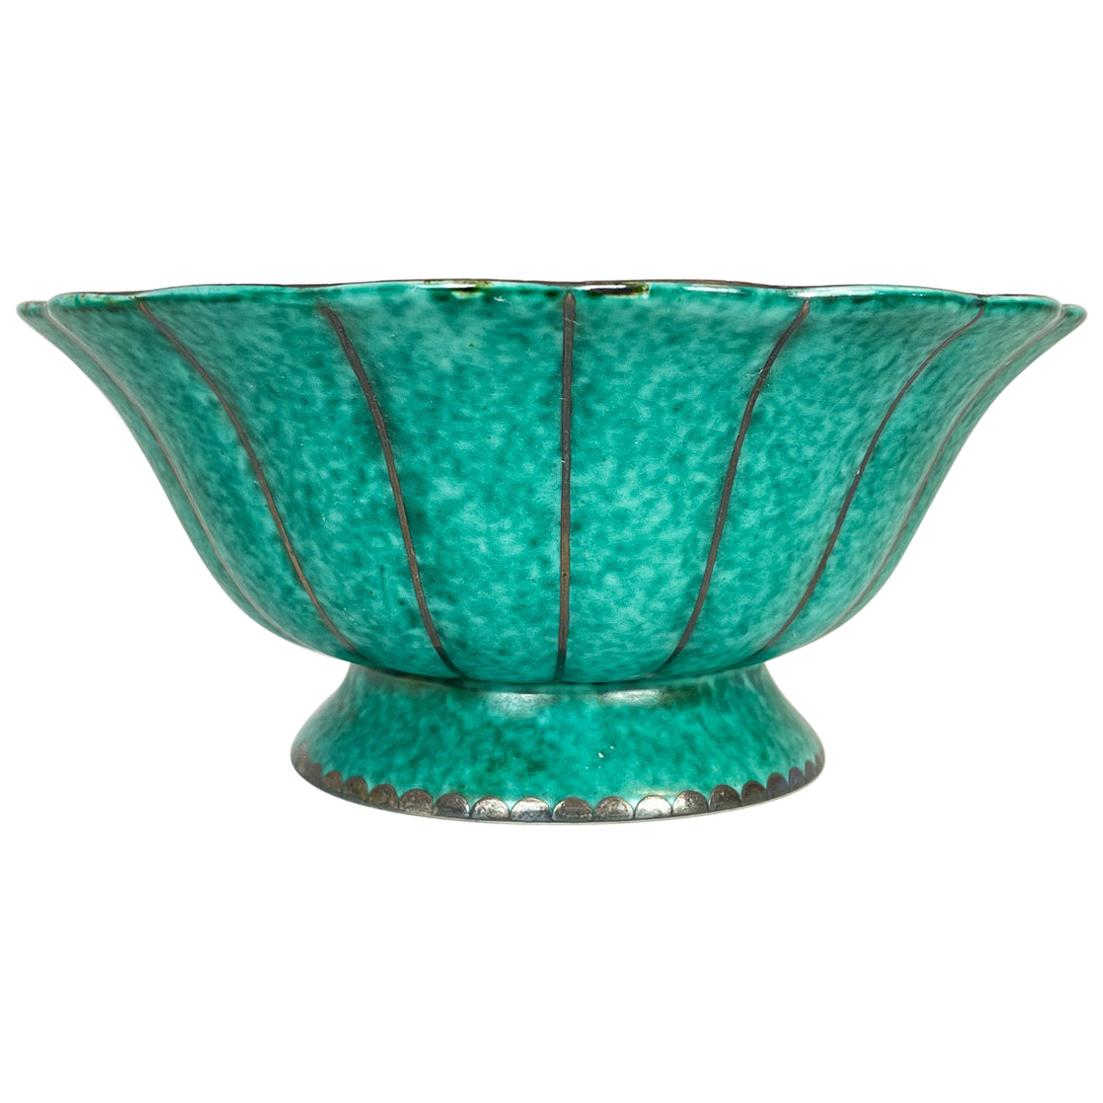 Art Deco Wilhelm Kåge Gustavsberg Argenta Bowl, Sweden, 1930s